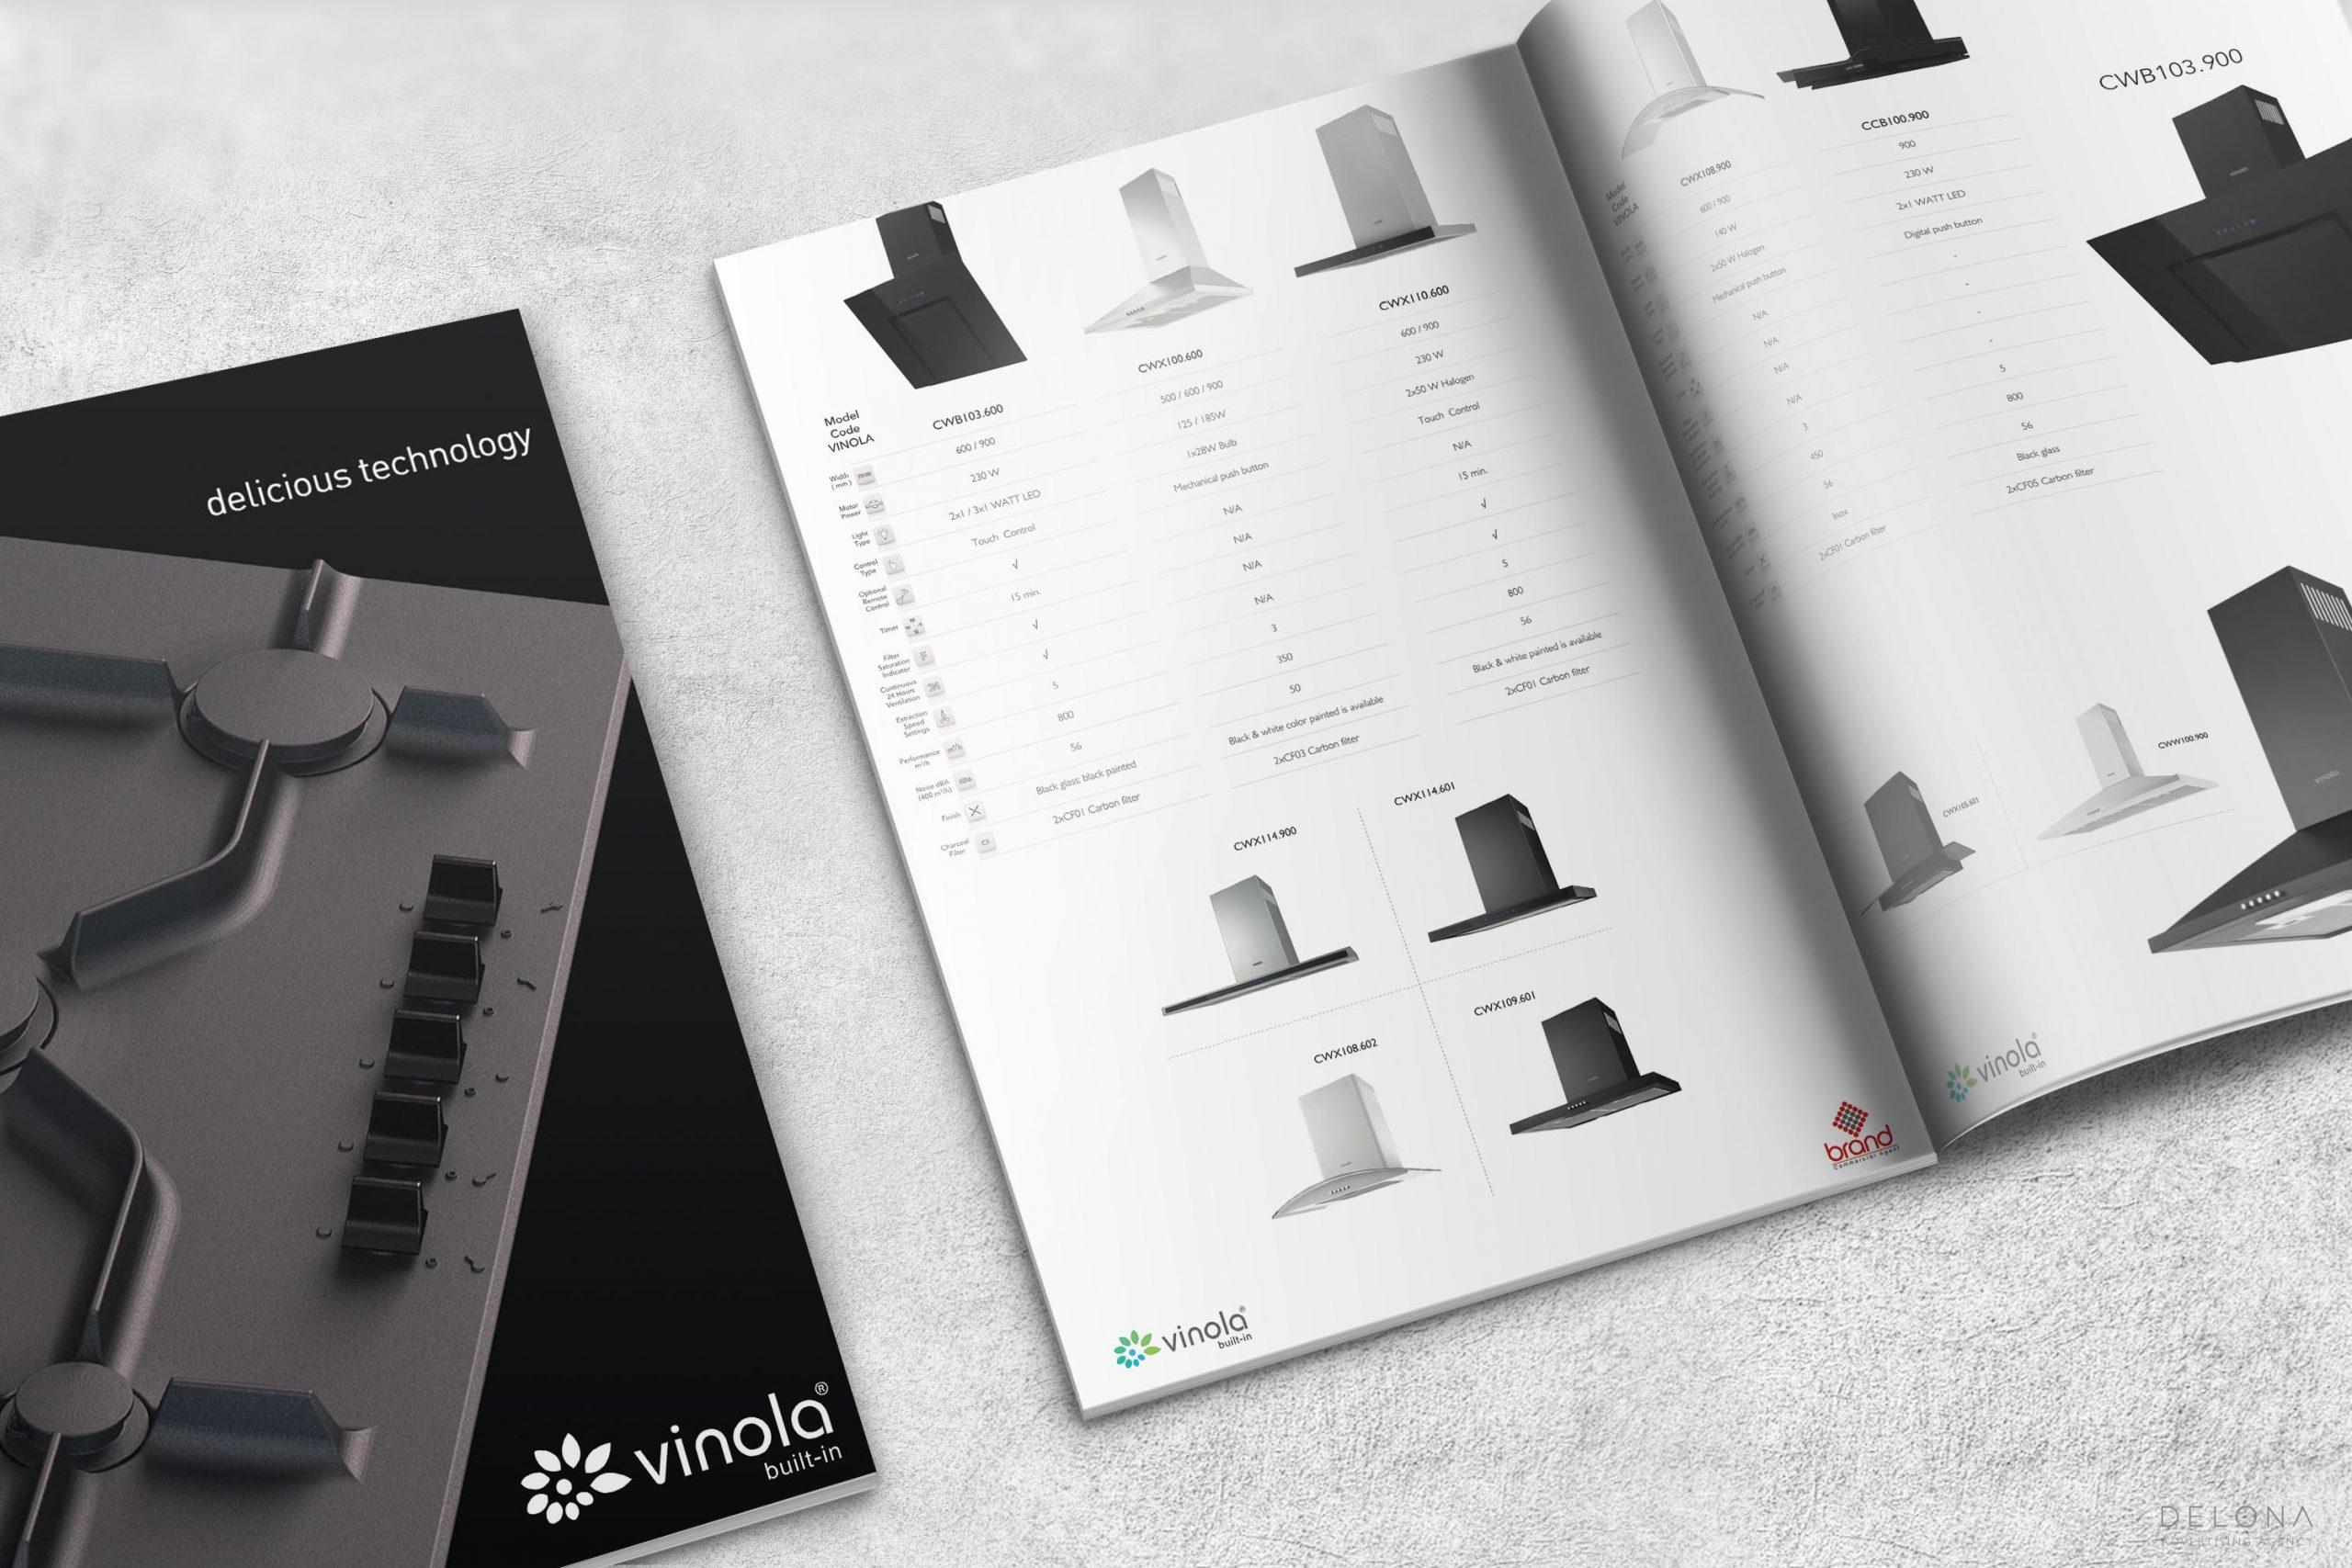 Vinola Product Catalog